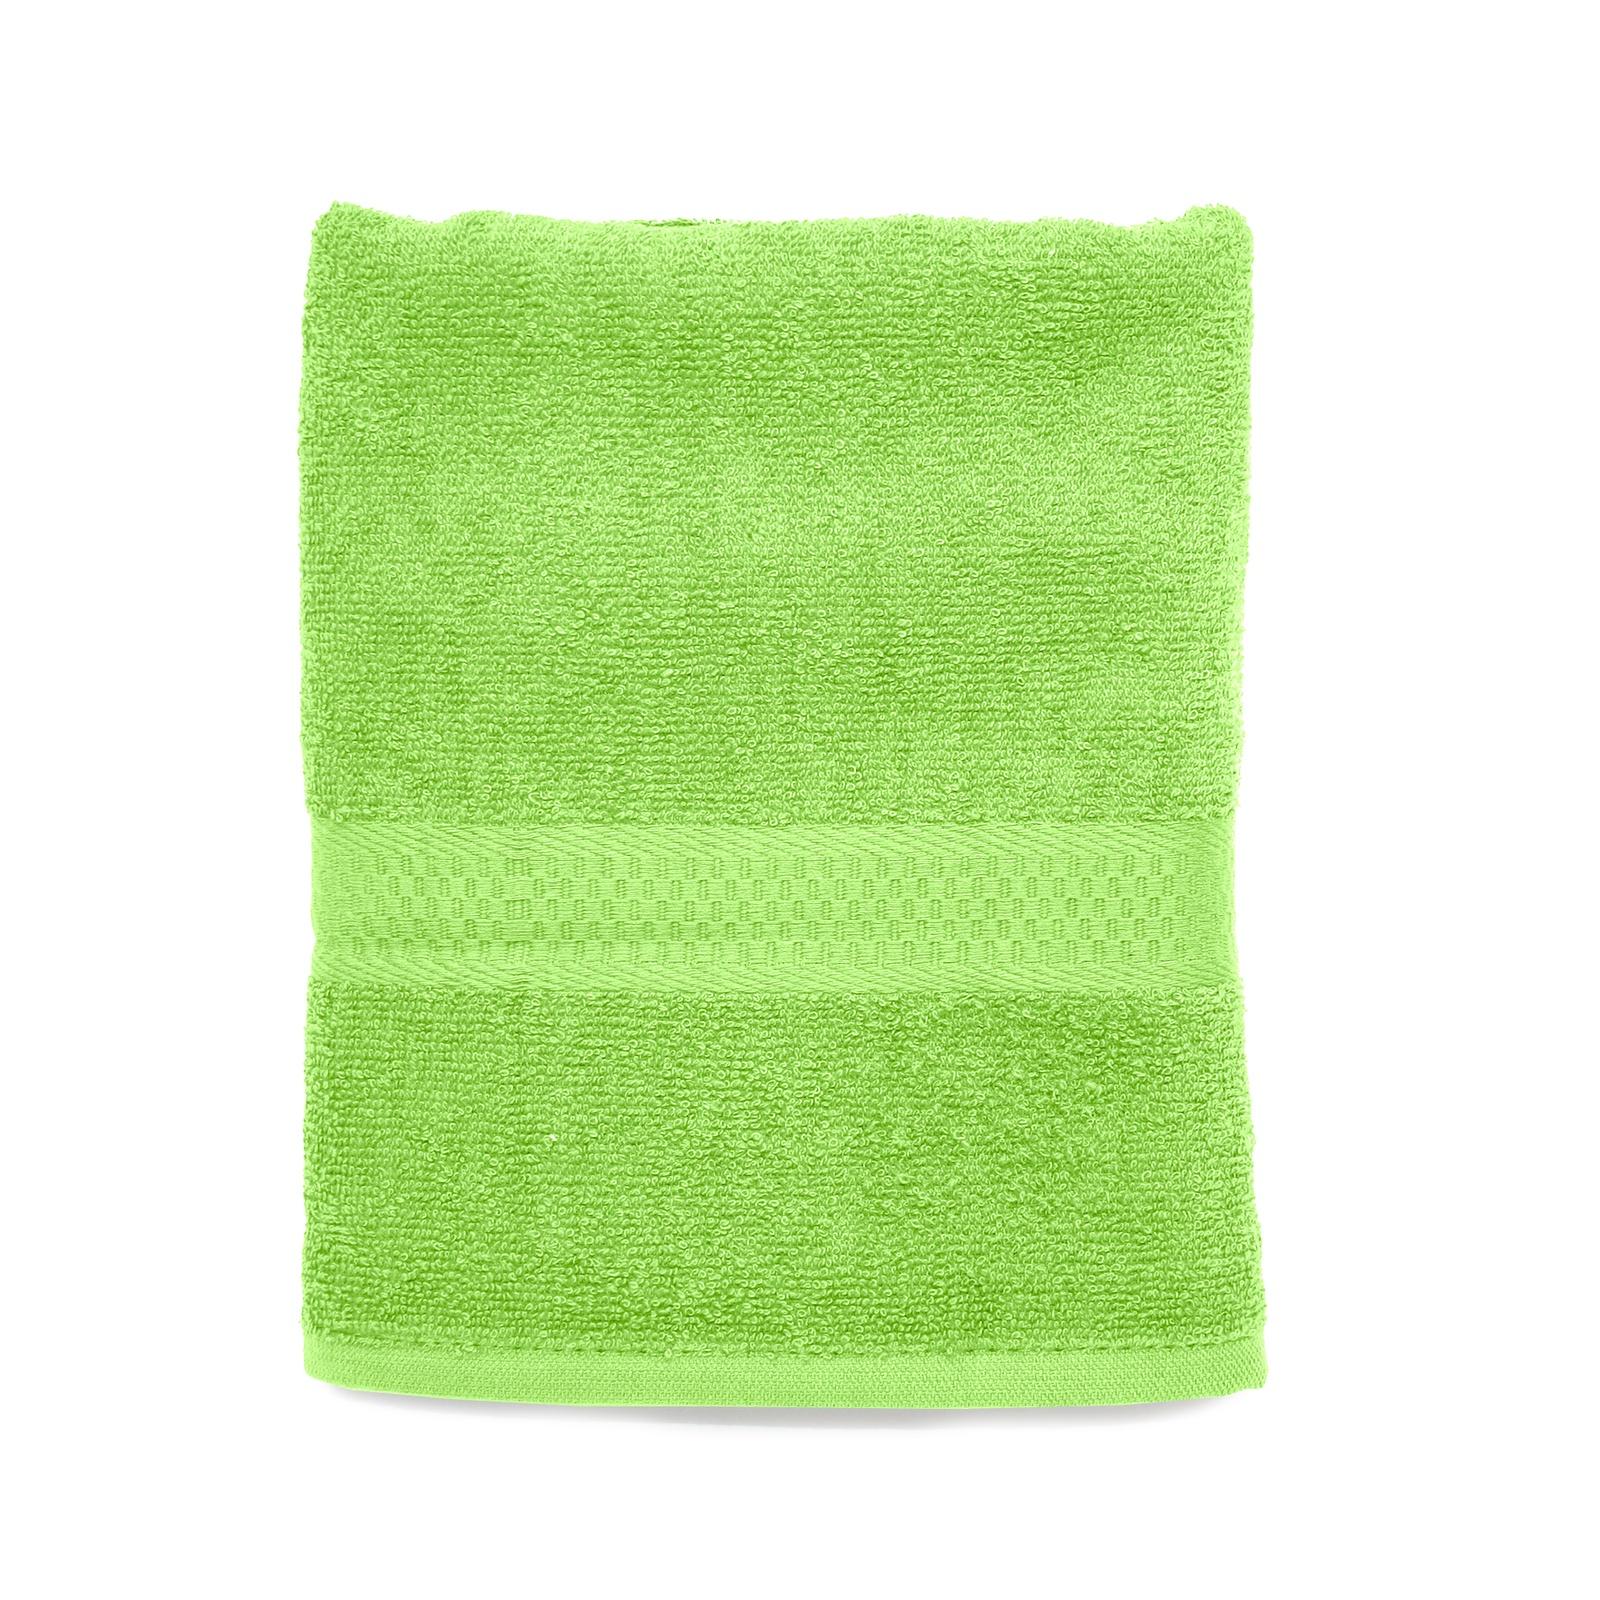 Полотенце банное Spany, 21311318196, махровое, светло-зеленый, 70 х 130 см Spany